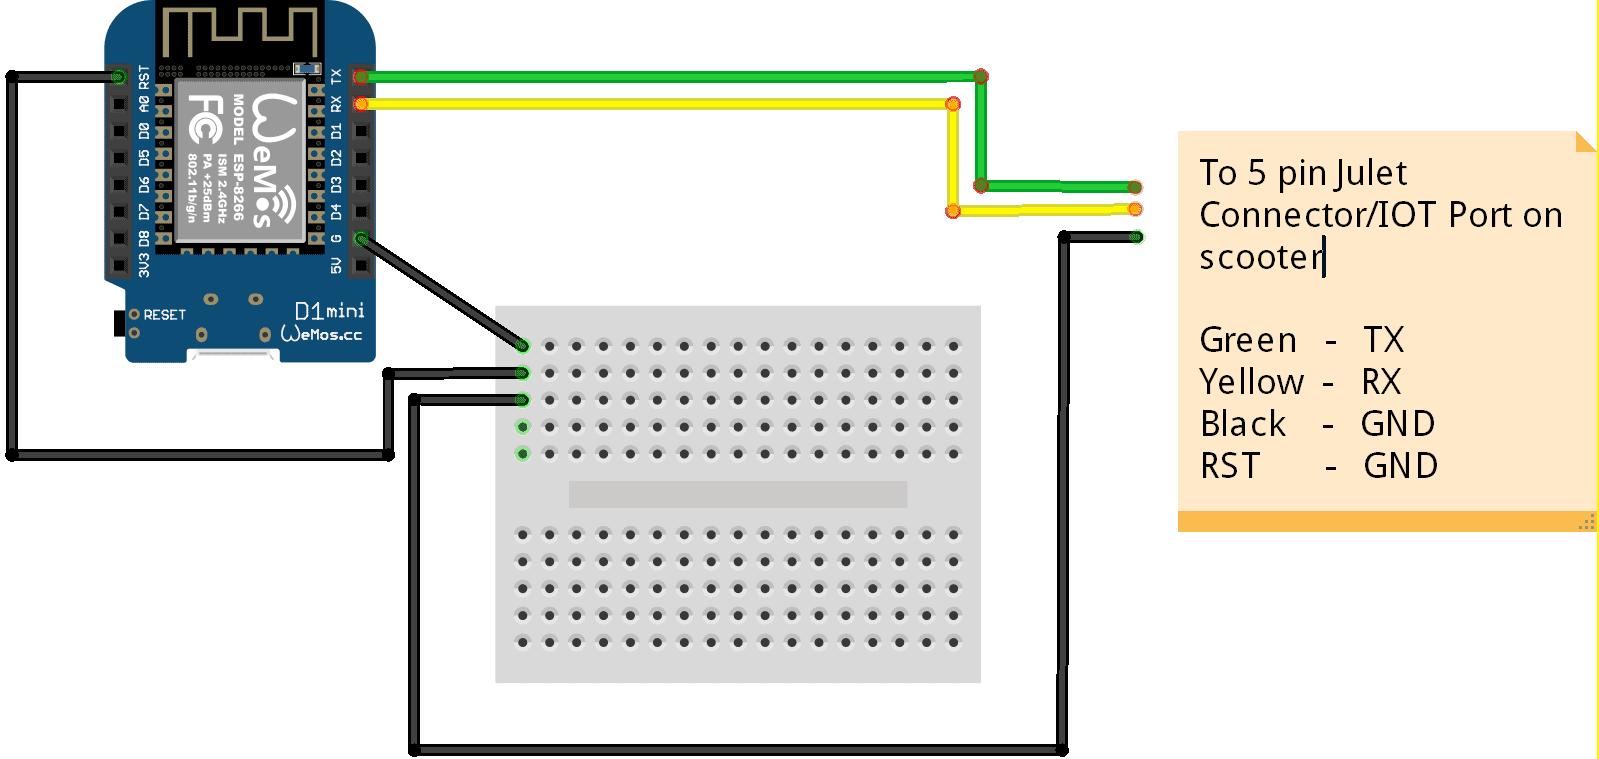 Connecting Ninebot IAP via a Wemos D1 Mini